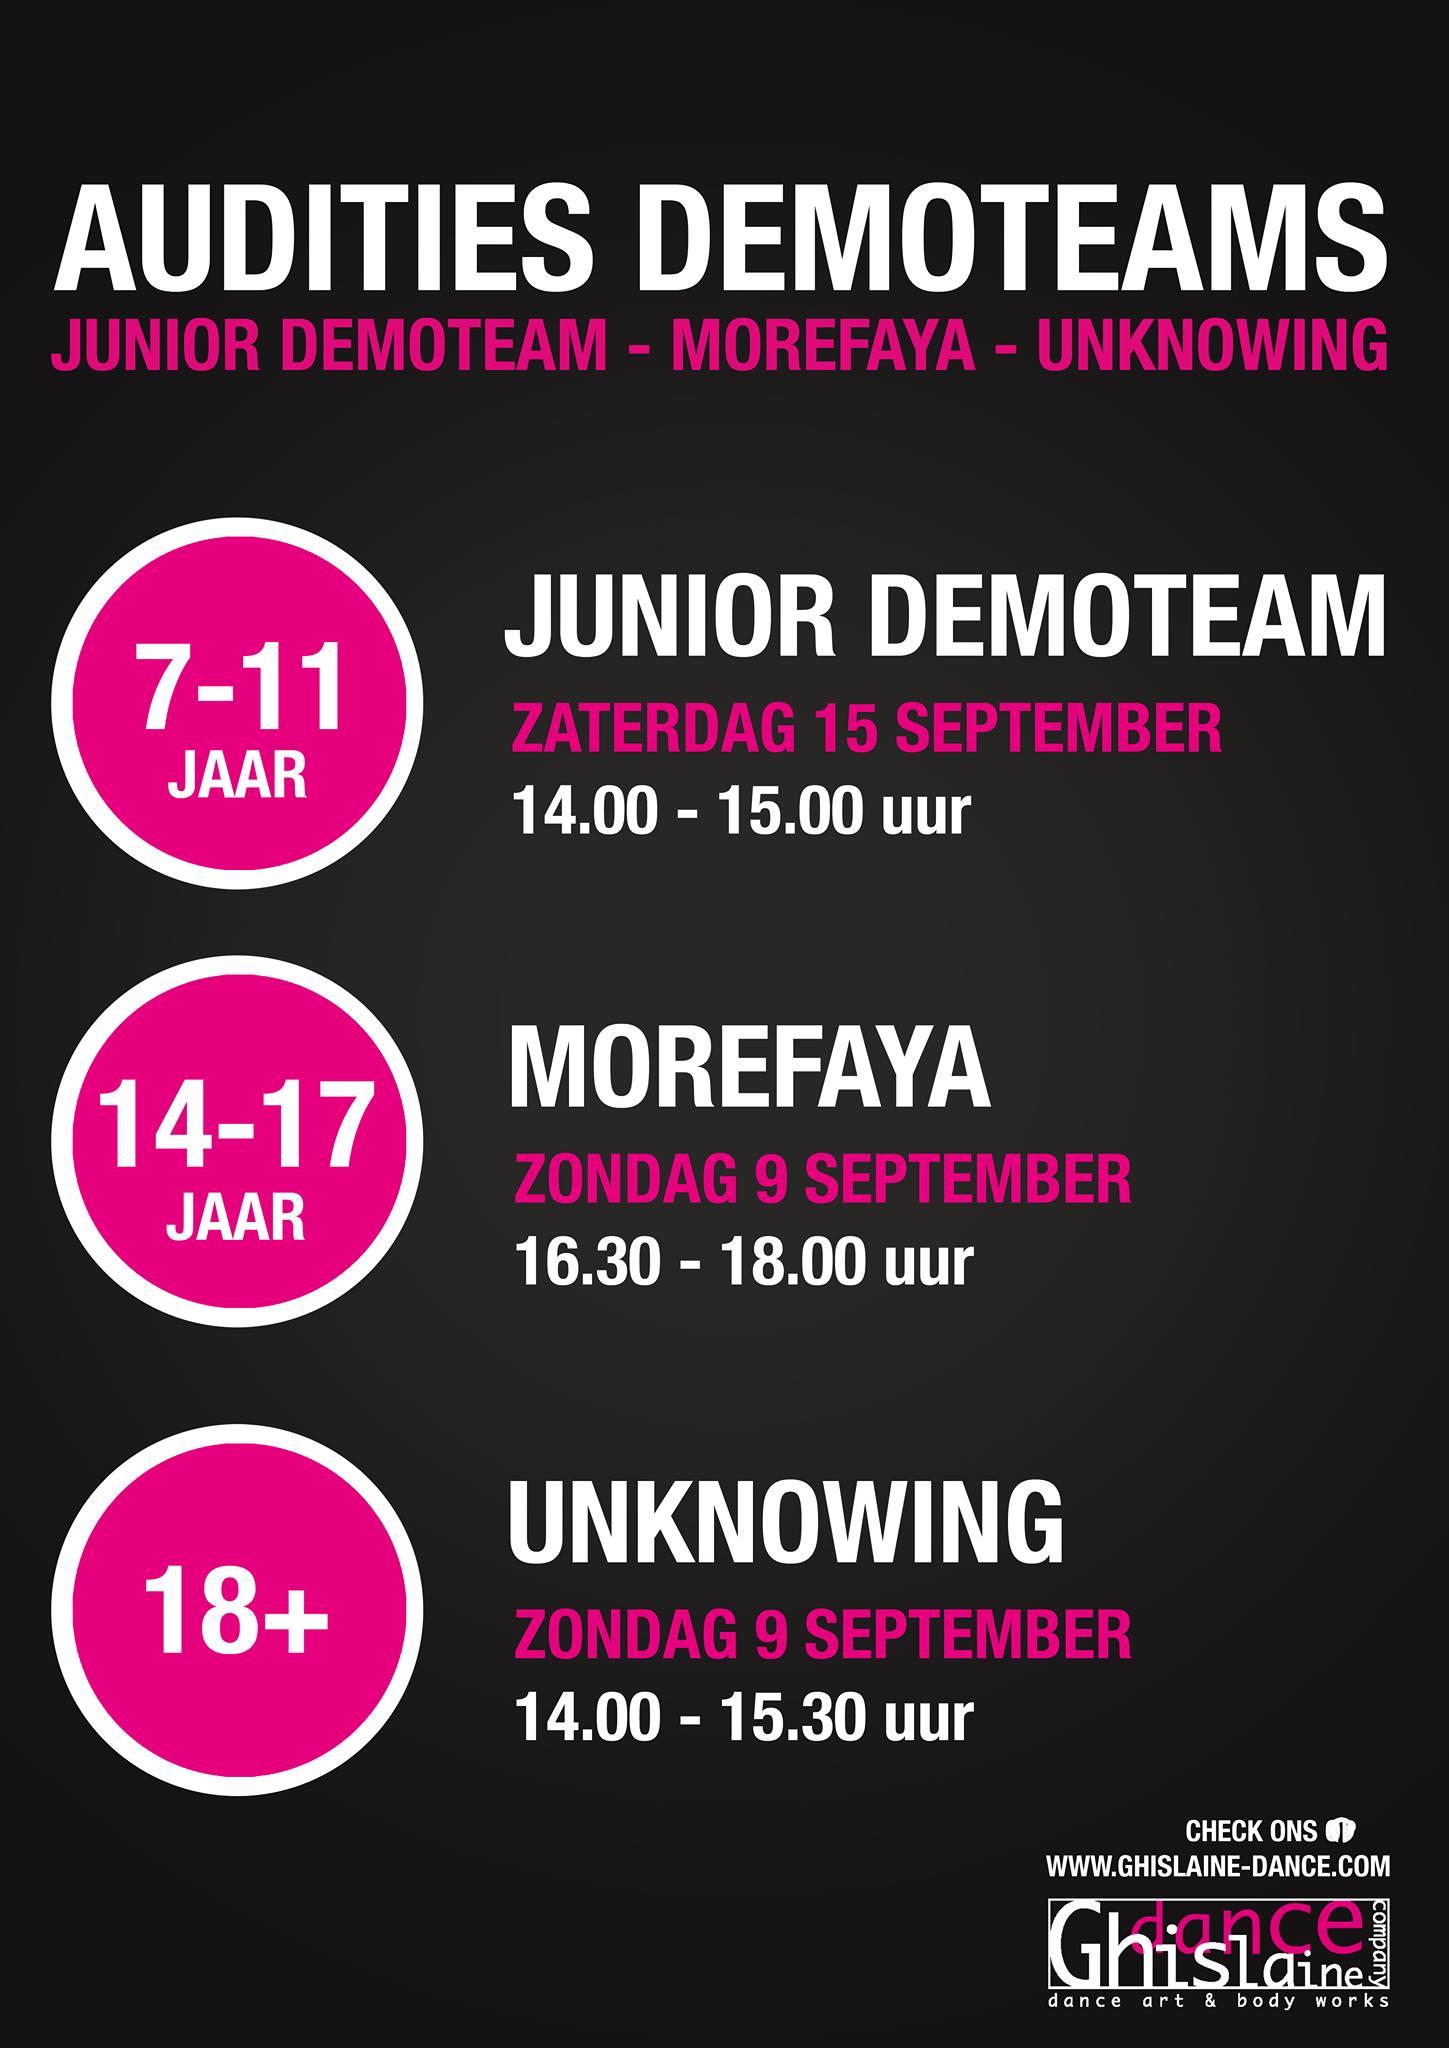 Auditie demoteams Breda Ghislaine Dance Company